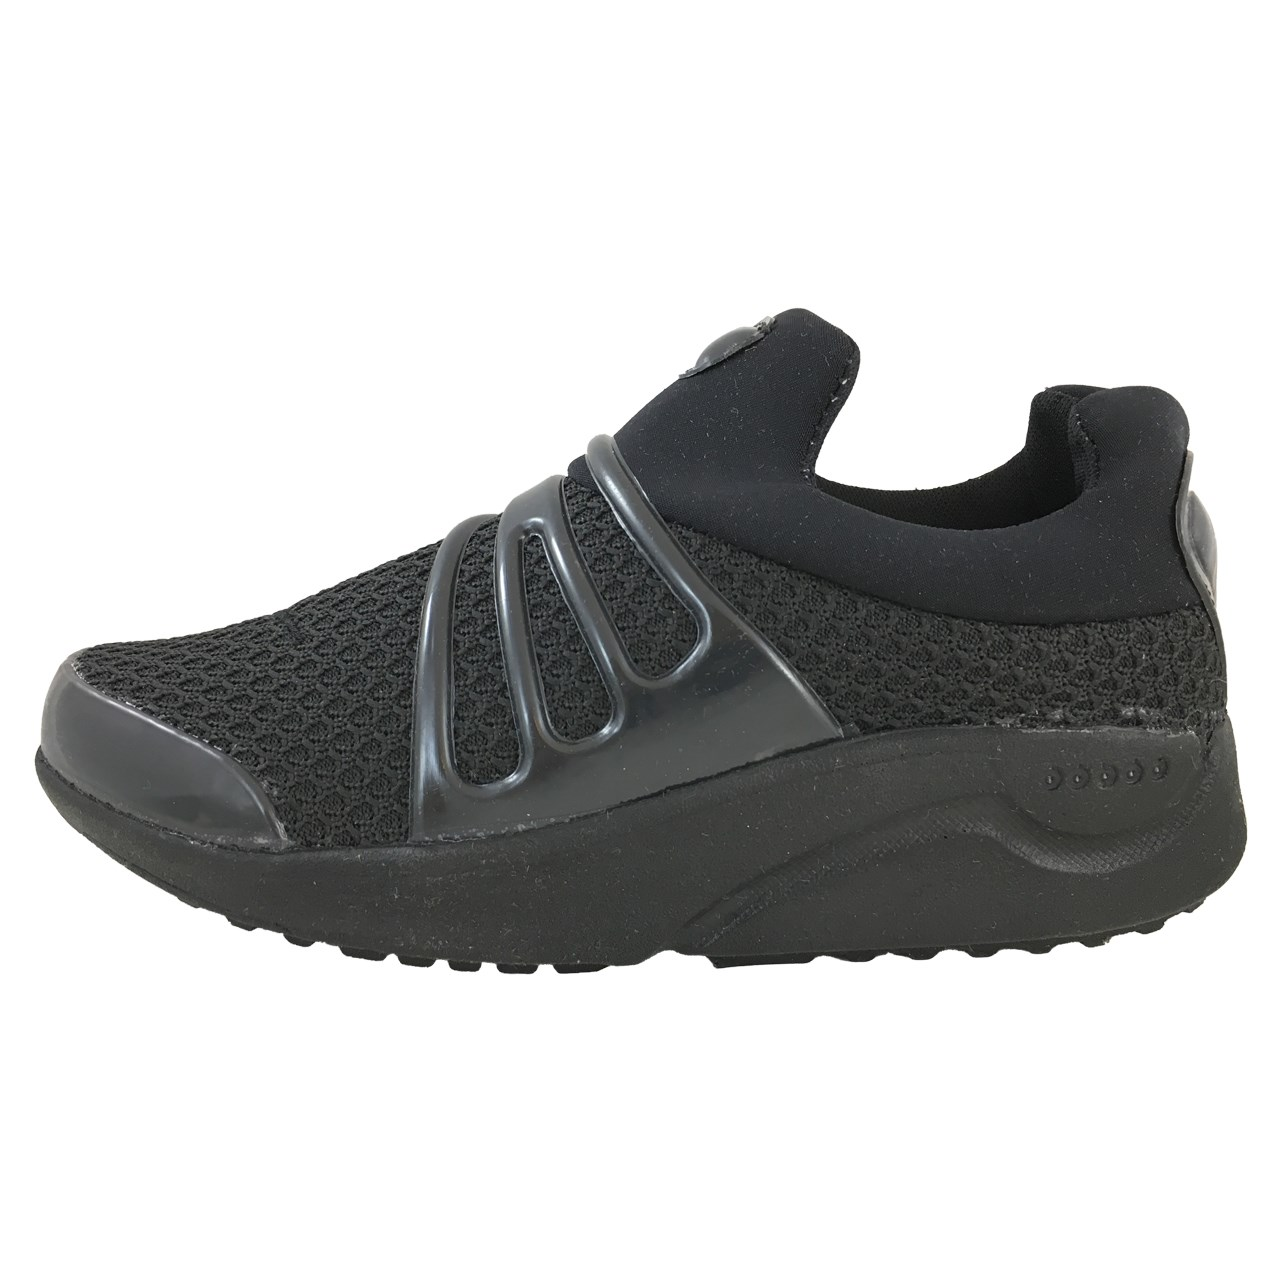 کفش مخصوص دویدن مردانه پرستو کد 2226